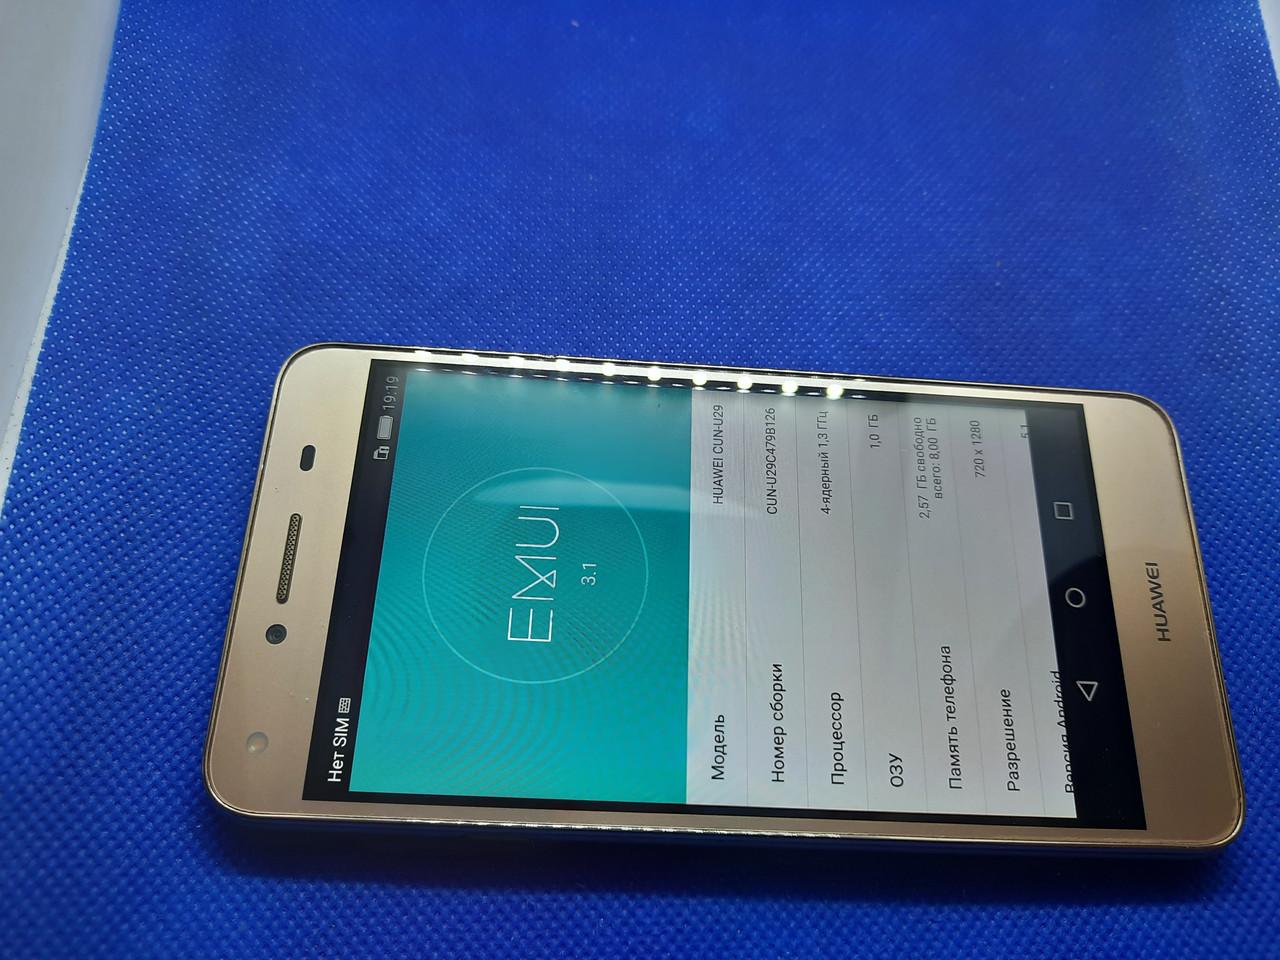 Huawei Y5 II 1/8GB #1232ВР